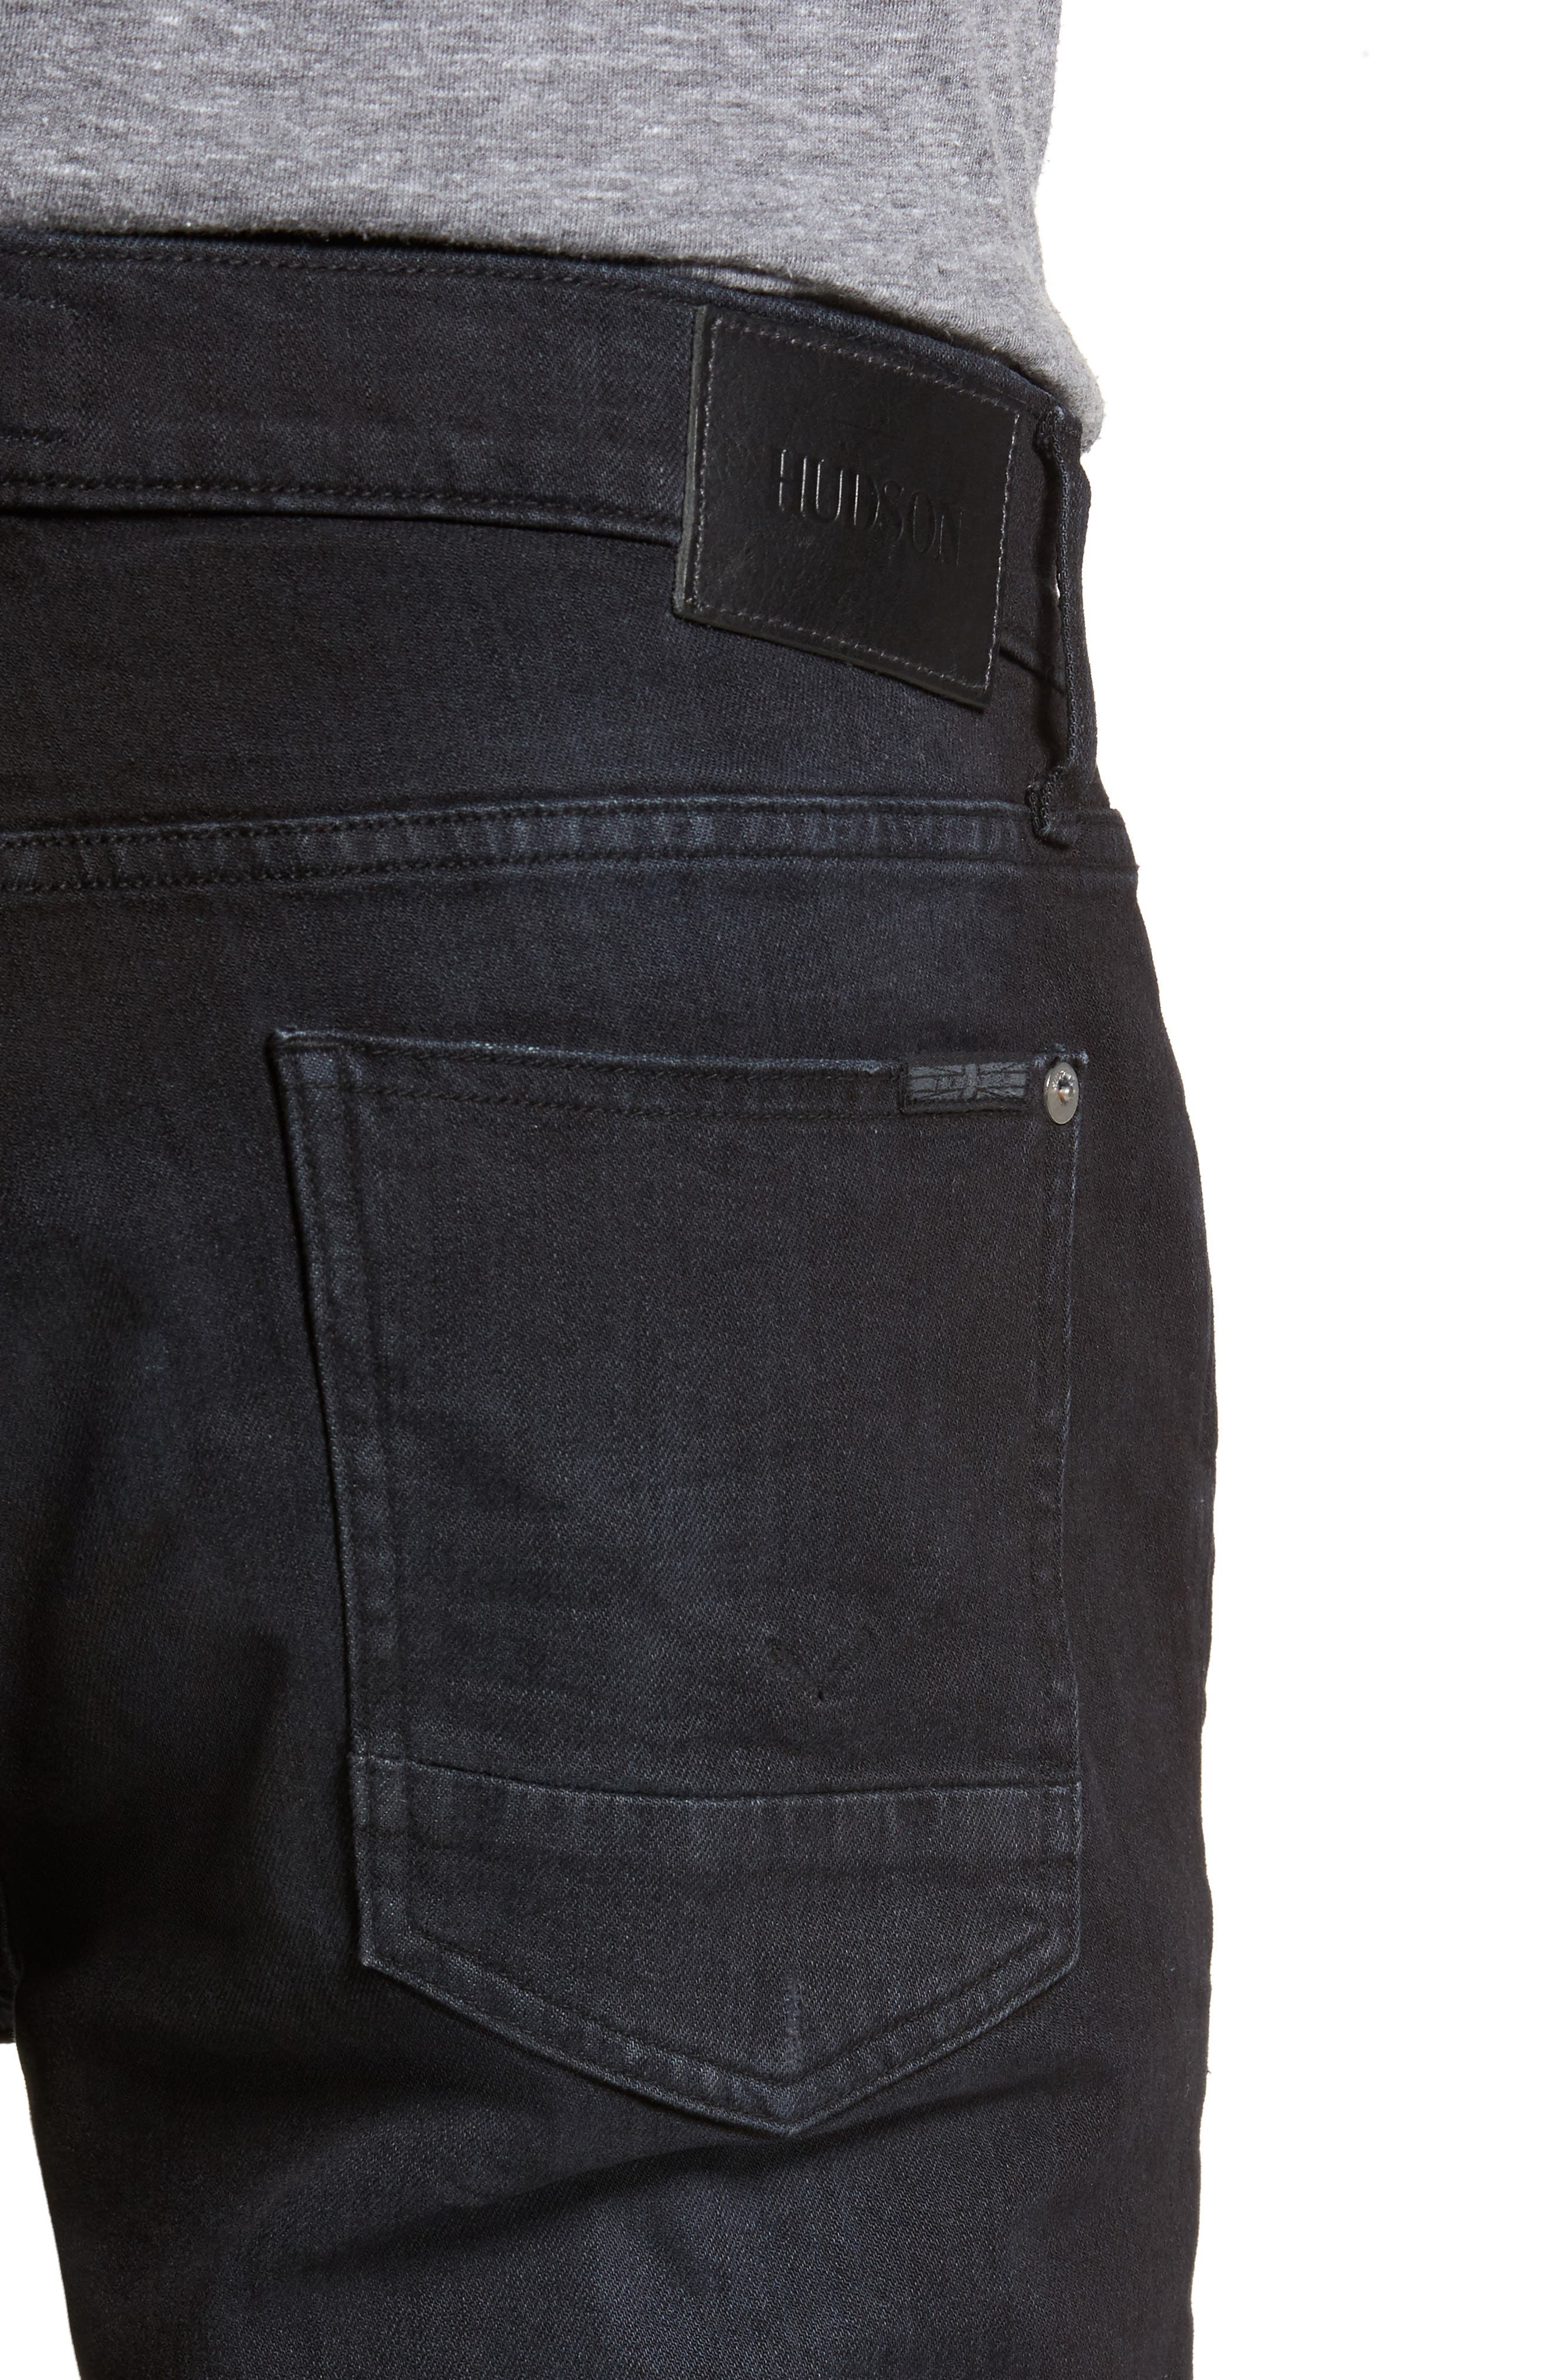 Sartor Skinny Fit Jeans,                             Alternate thumbnail 4, color,                             Low Key